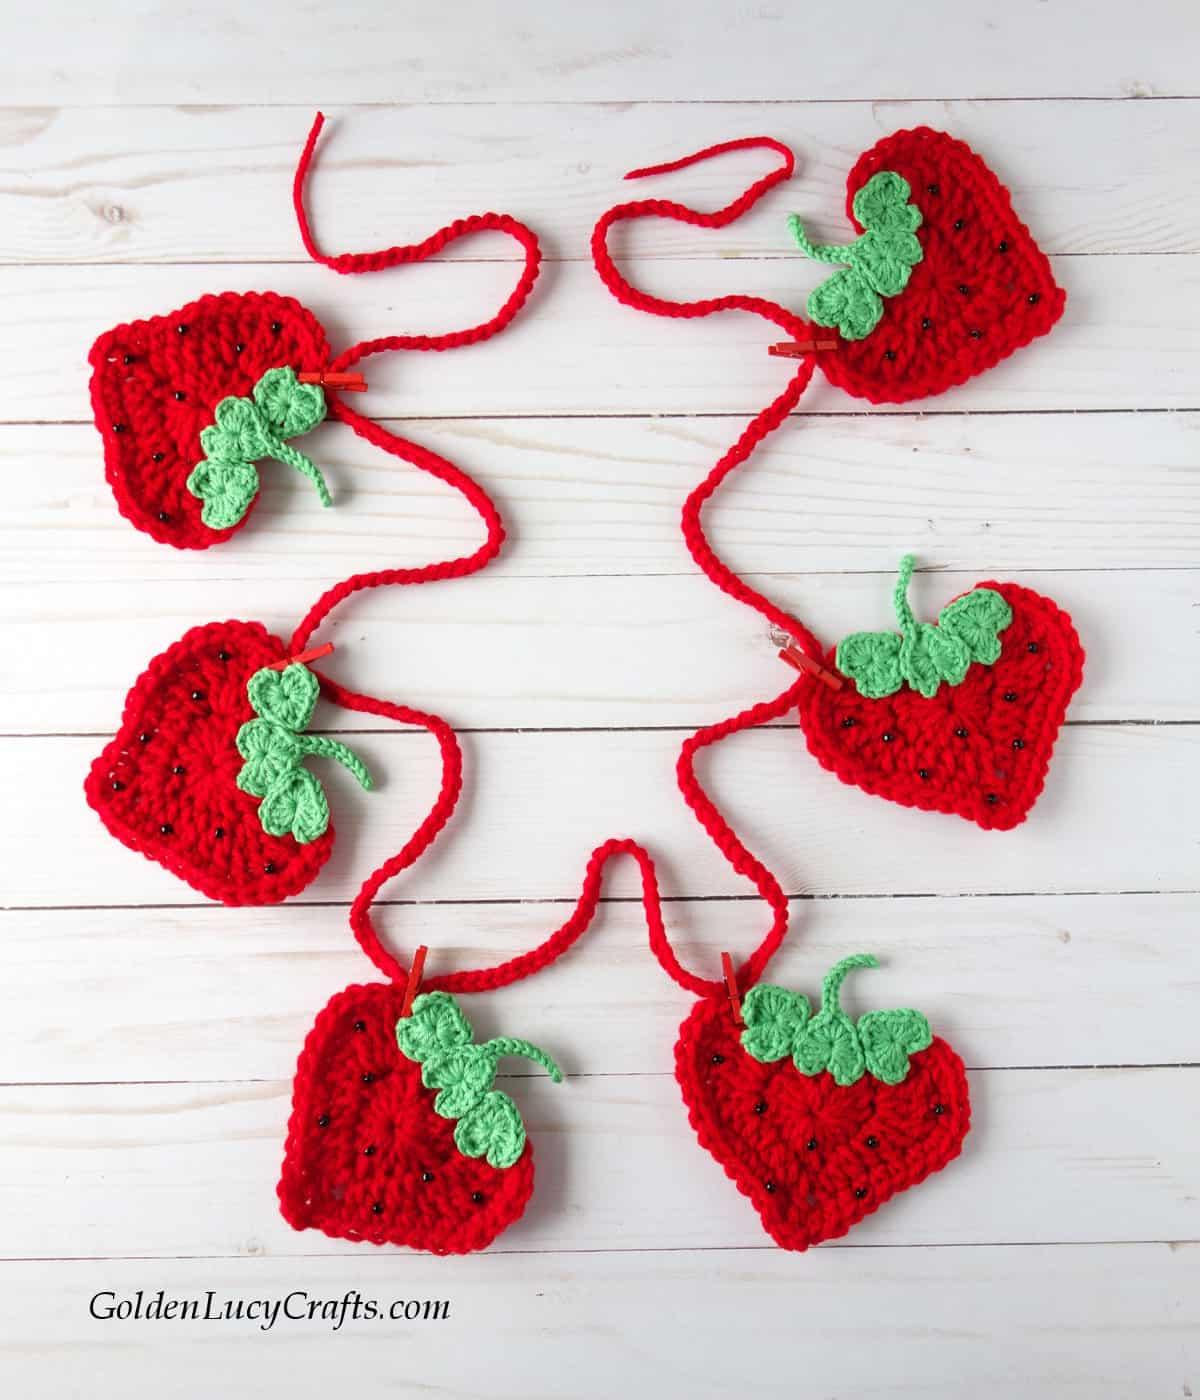 Crochet strawberry garland.